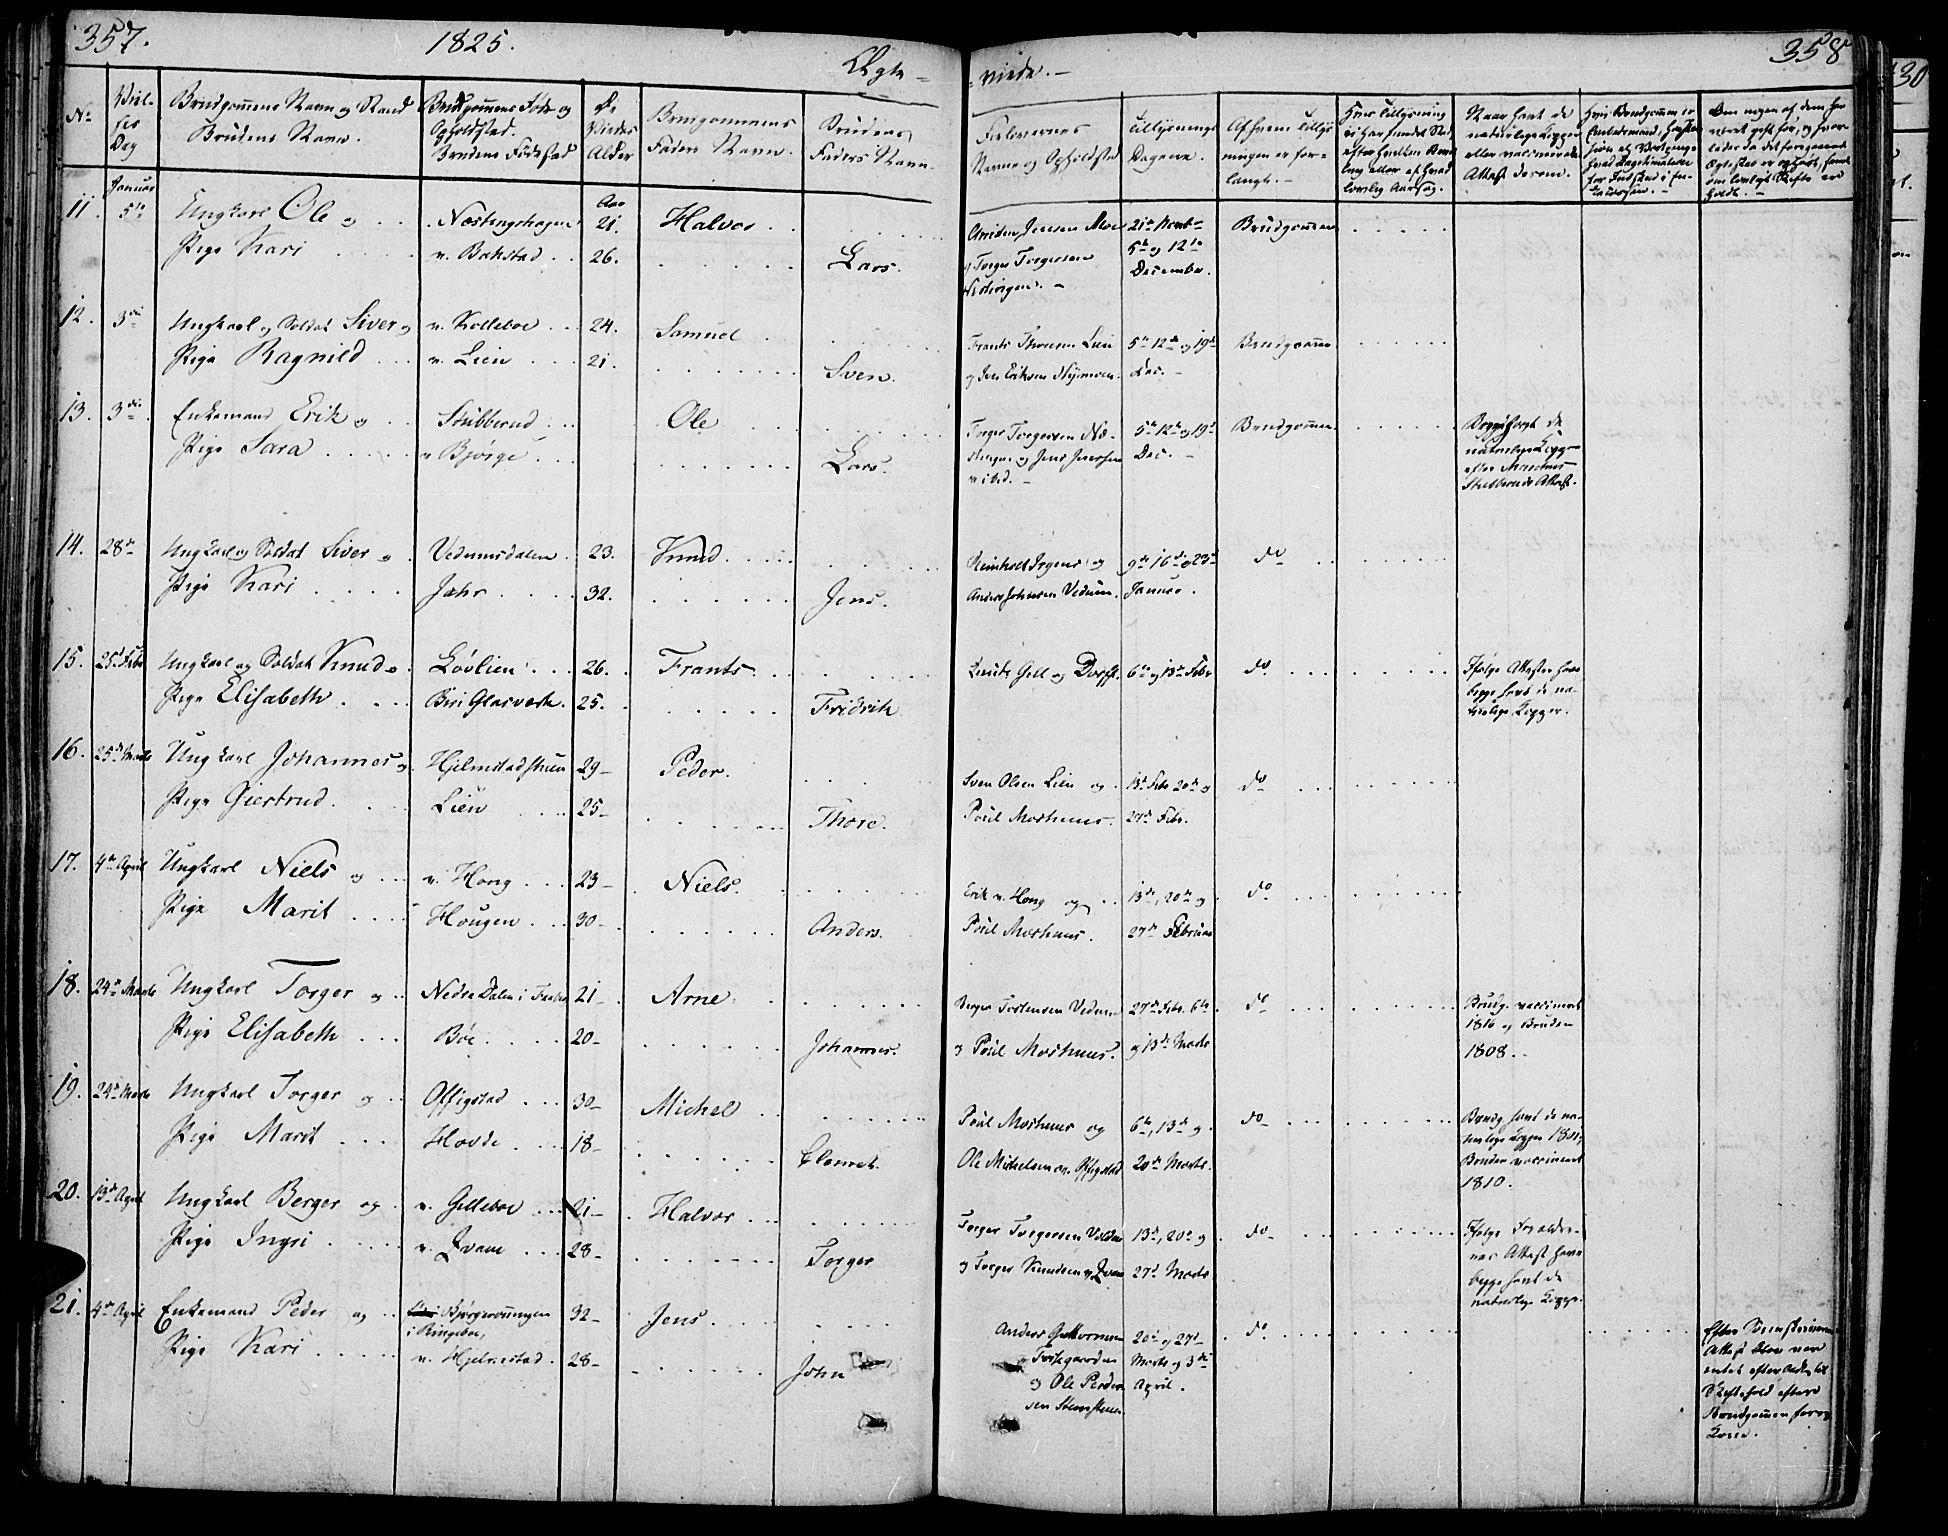 SAH, Øyer prestekontor, Ministerialbok nr. 4, 1824-1841, s. 357-358